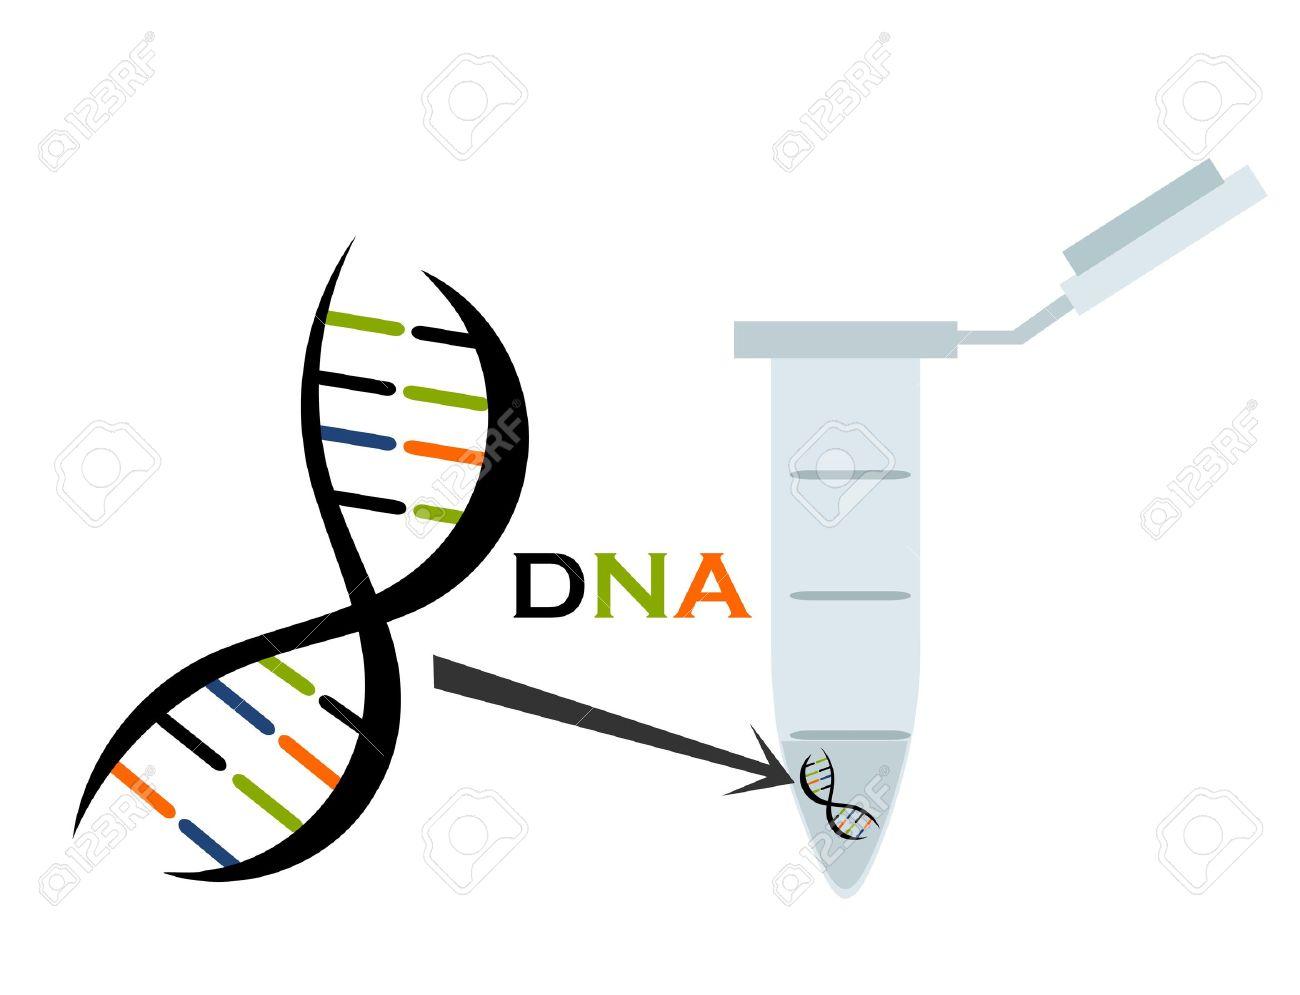 DNA in test tube eppendorf. Molecular biology science. Vector illustration Stock Vector - 9838270